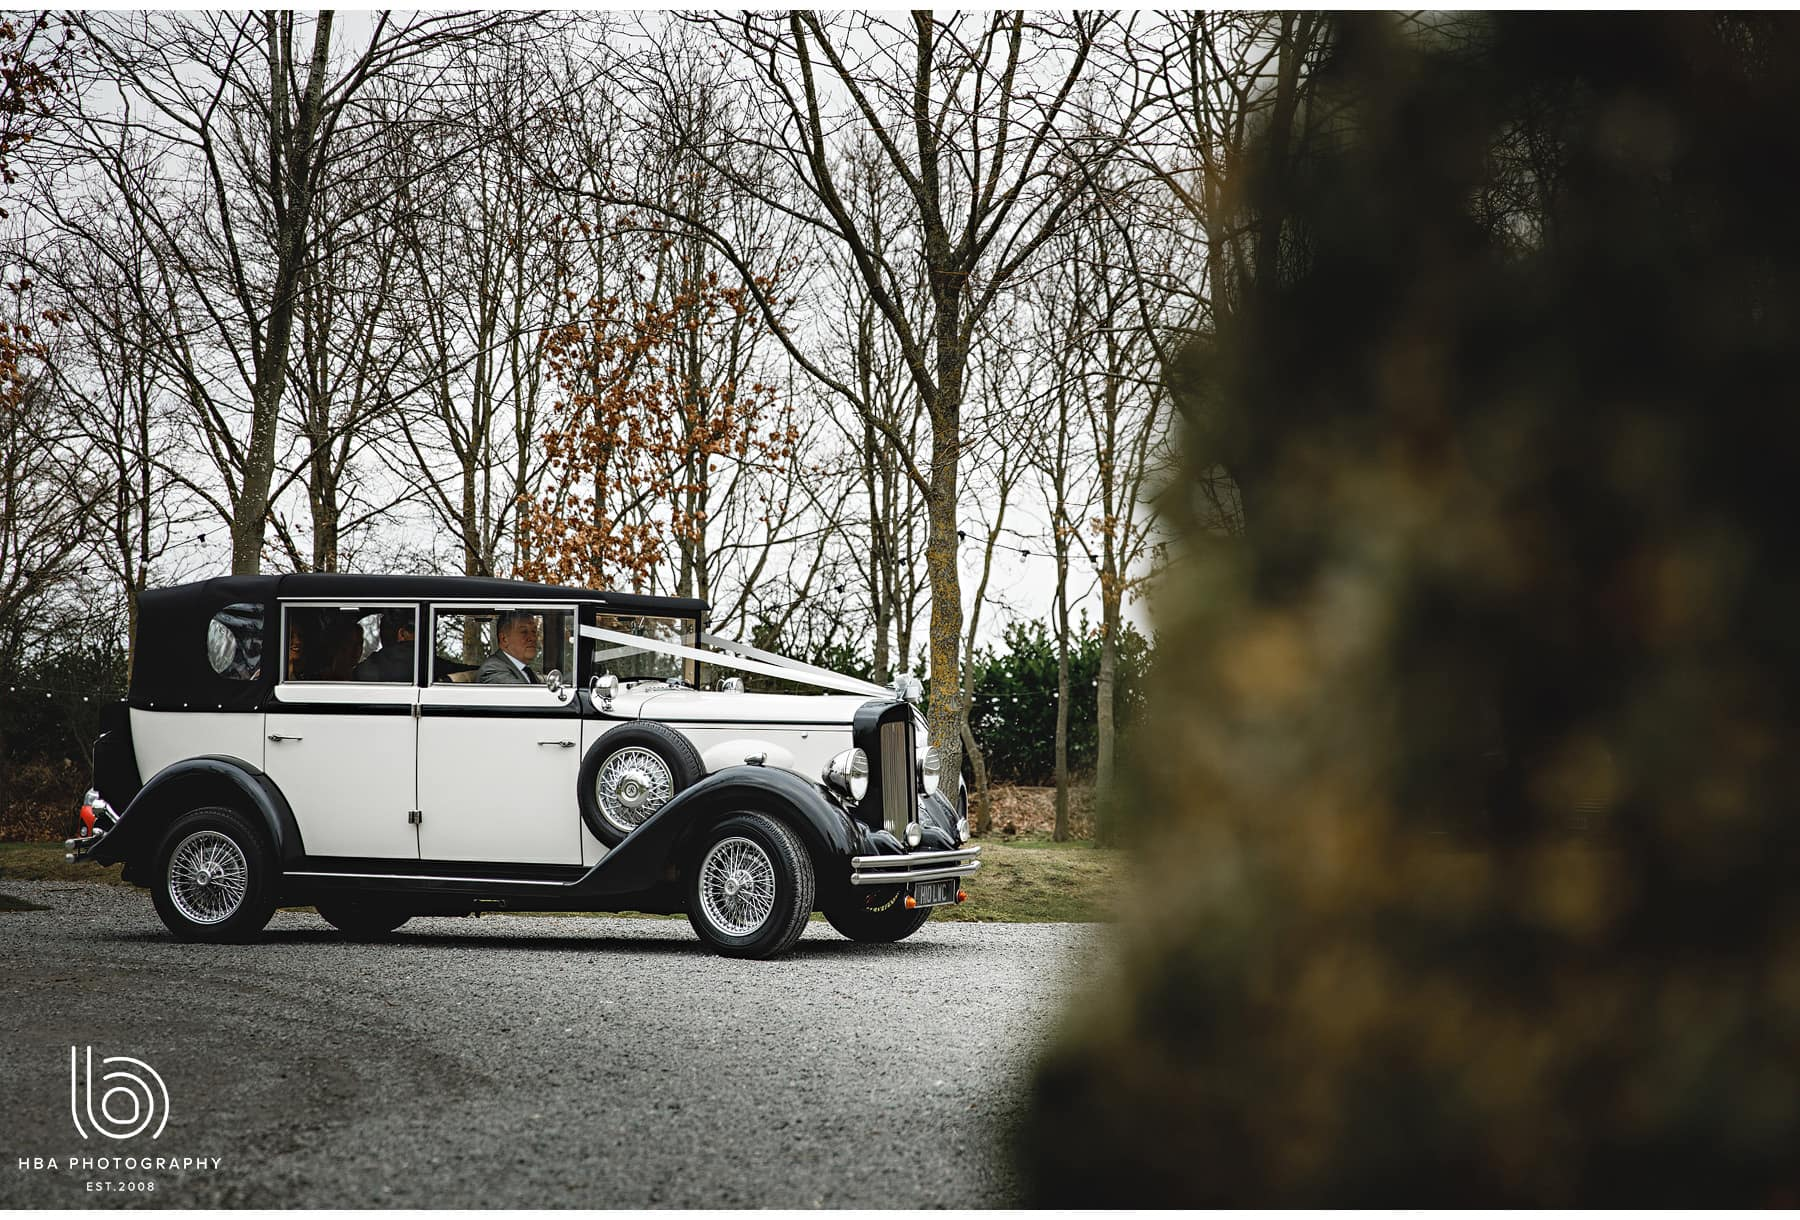 the wedding car arriving